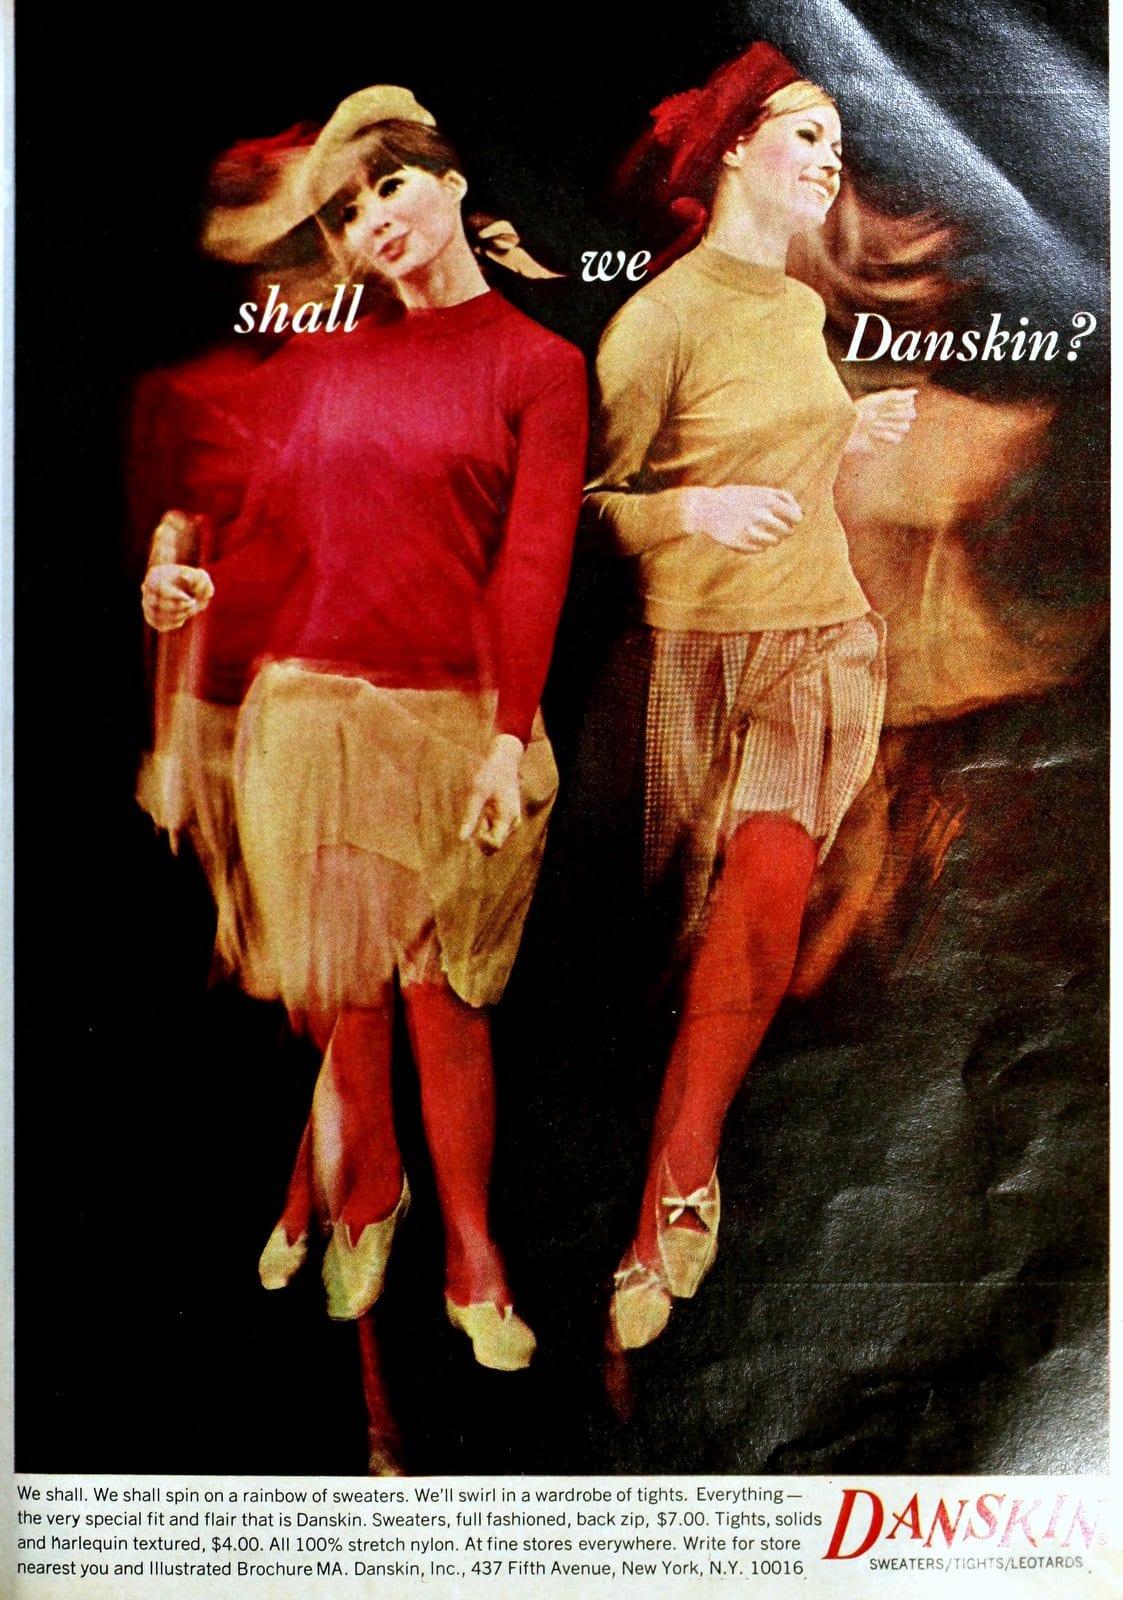 Danskin womenswear - Skirts and sweaters (1965)